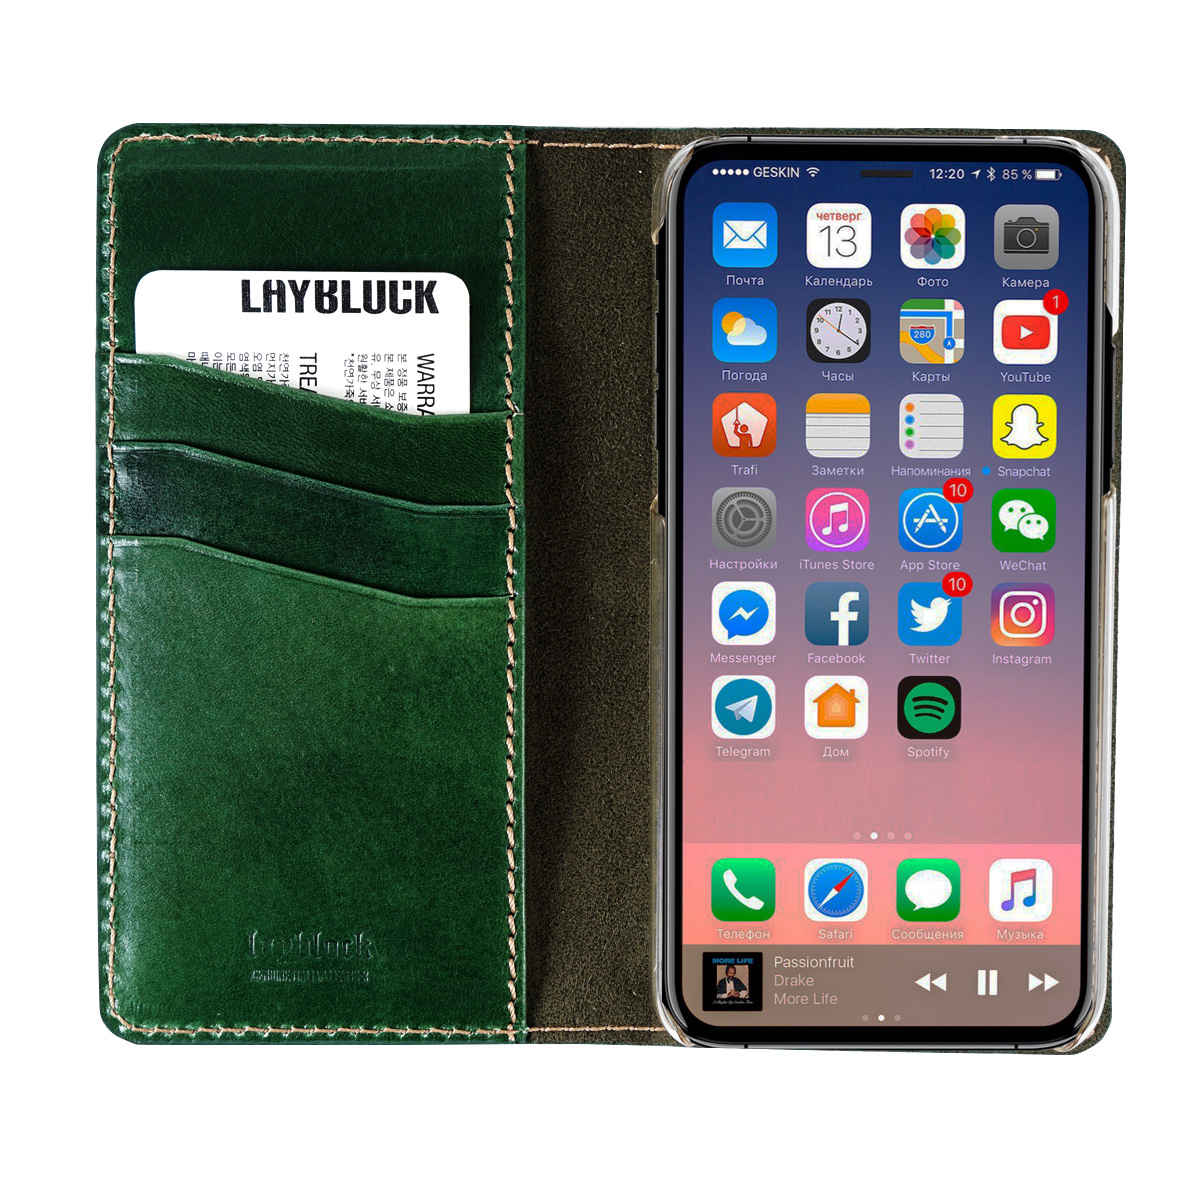 iPhone XS / X ケース iPhone XS Max ケース iPhone XR ケースLAYBLOCK Tuscany Belly 手帳型 本革 (レイブロック トスカニーベリー)アイフォン レザー カバー